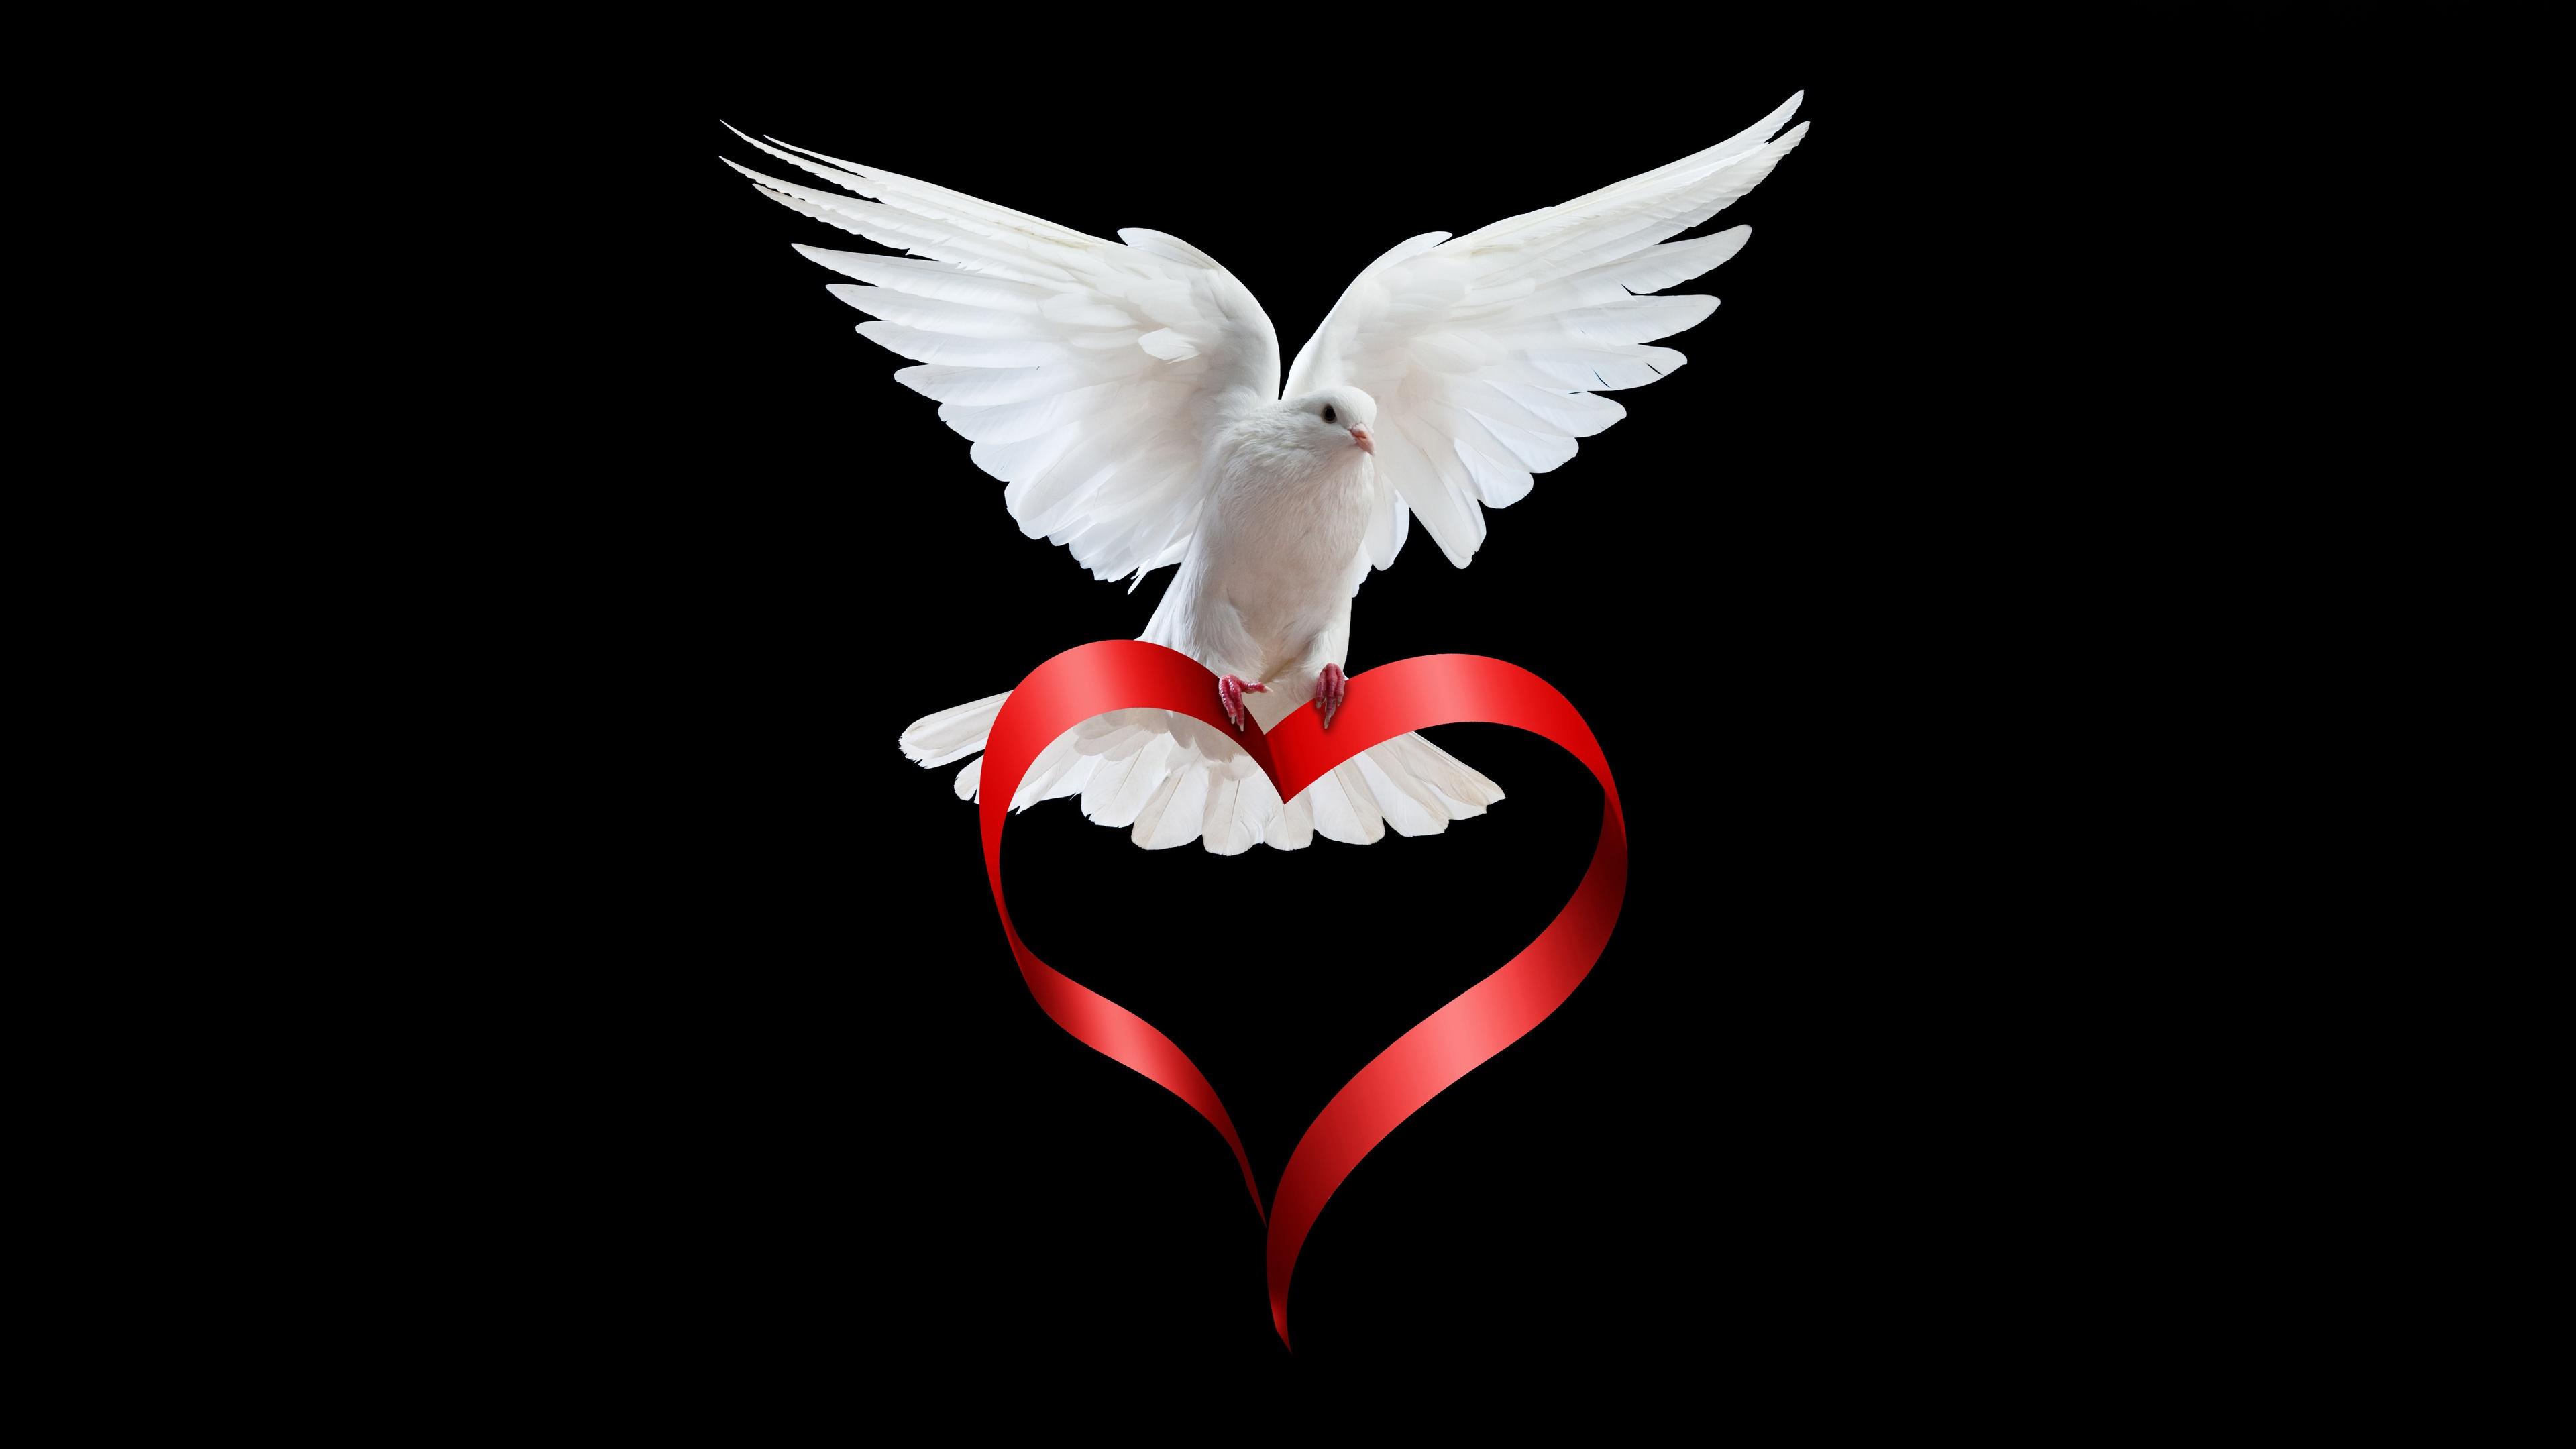 pigeon-love-story-9o.jpg